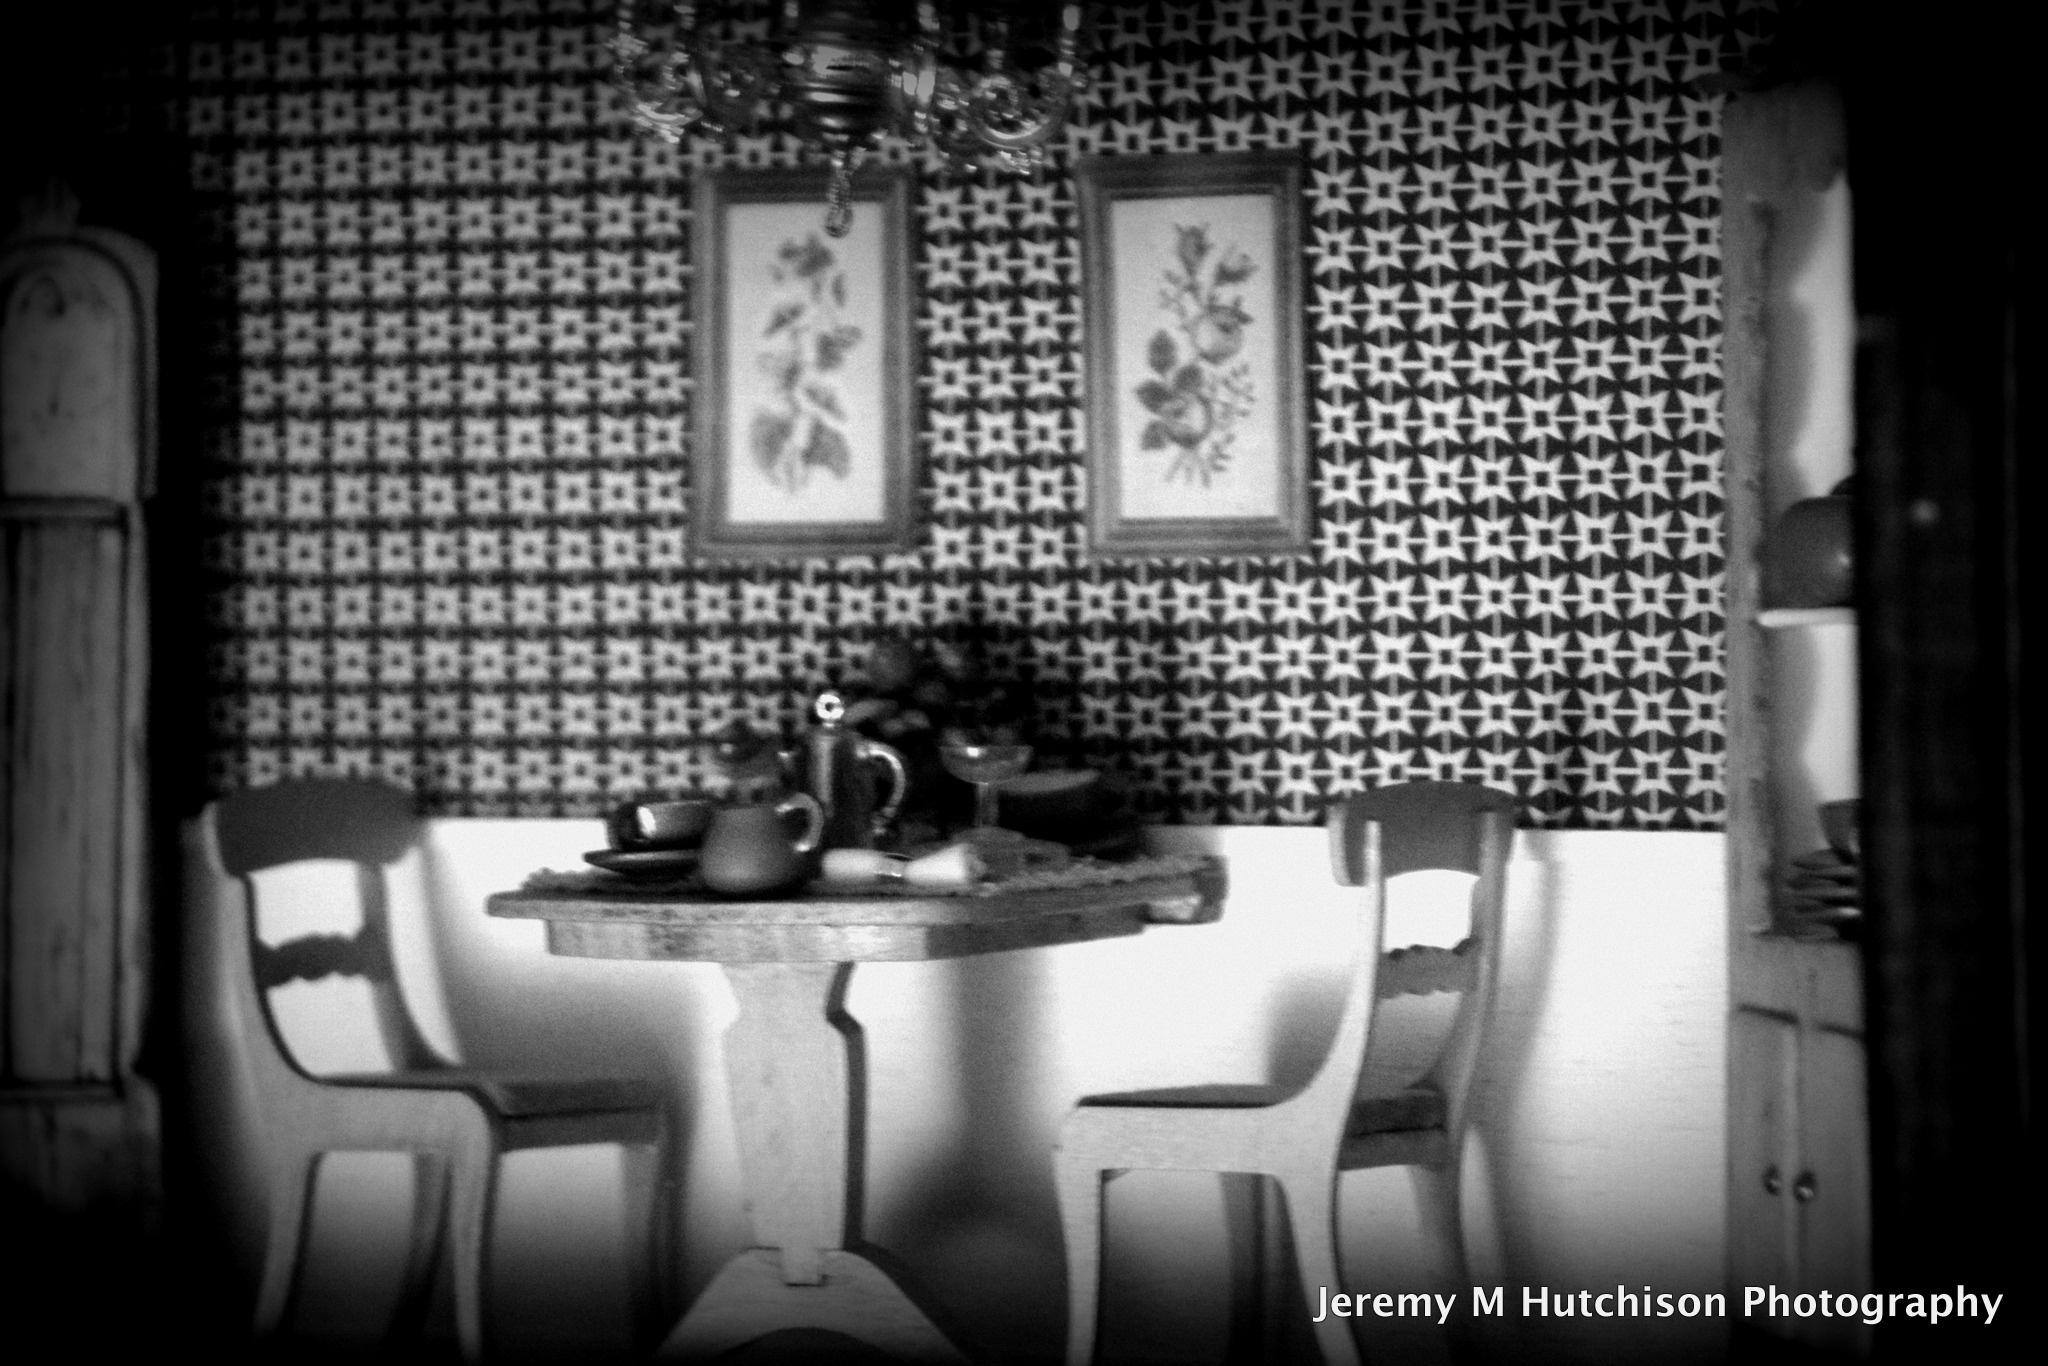 Shadow Box Dollhouse Kitchen by Jeremy M Hutchison